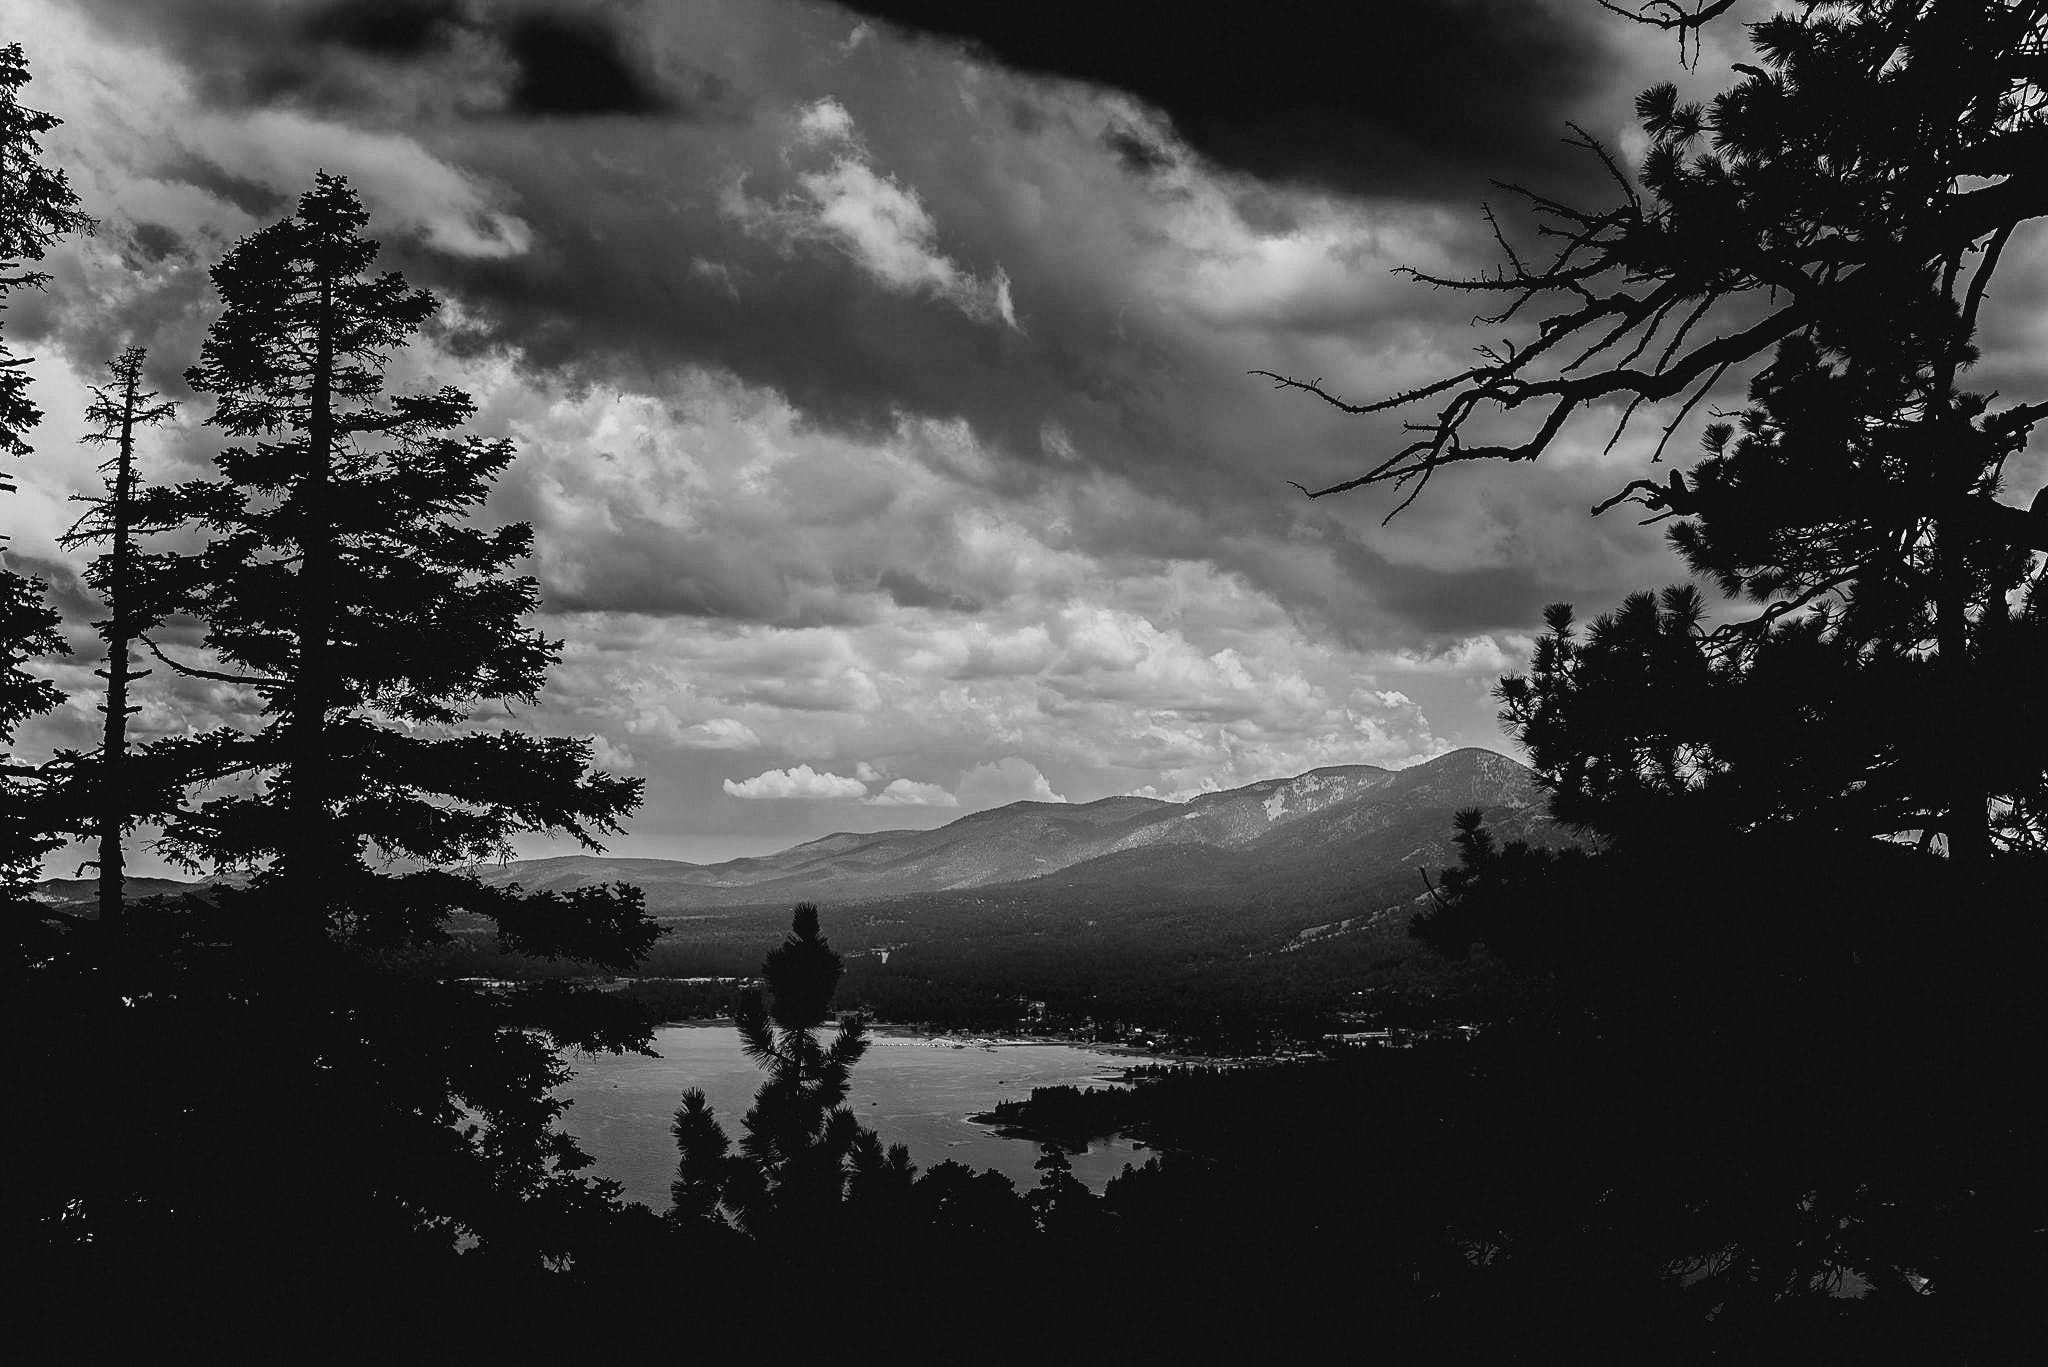 Kostenloses Stock Foto zu bäume, berge, bewölkt, einfarbig